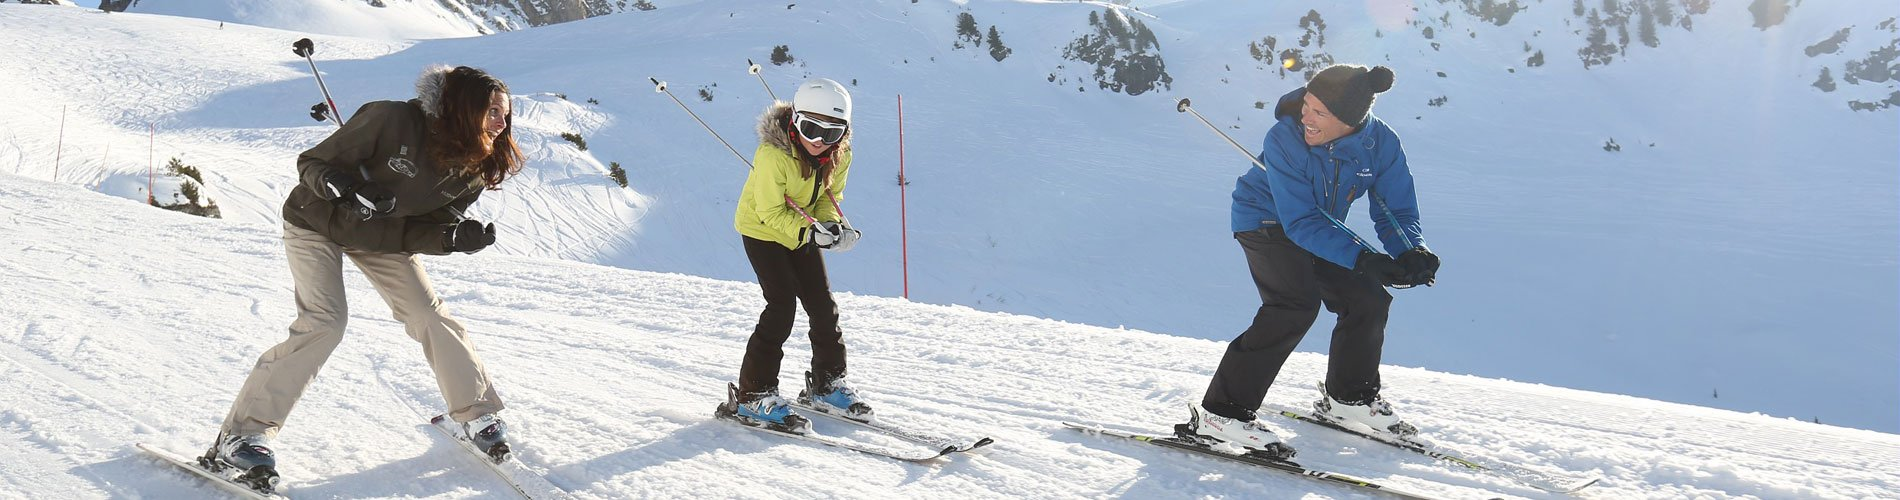 frankrijk-wintersport-banner-1900x500.jpg